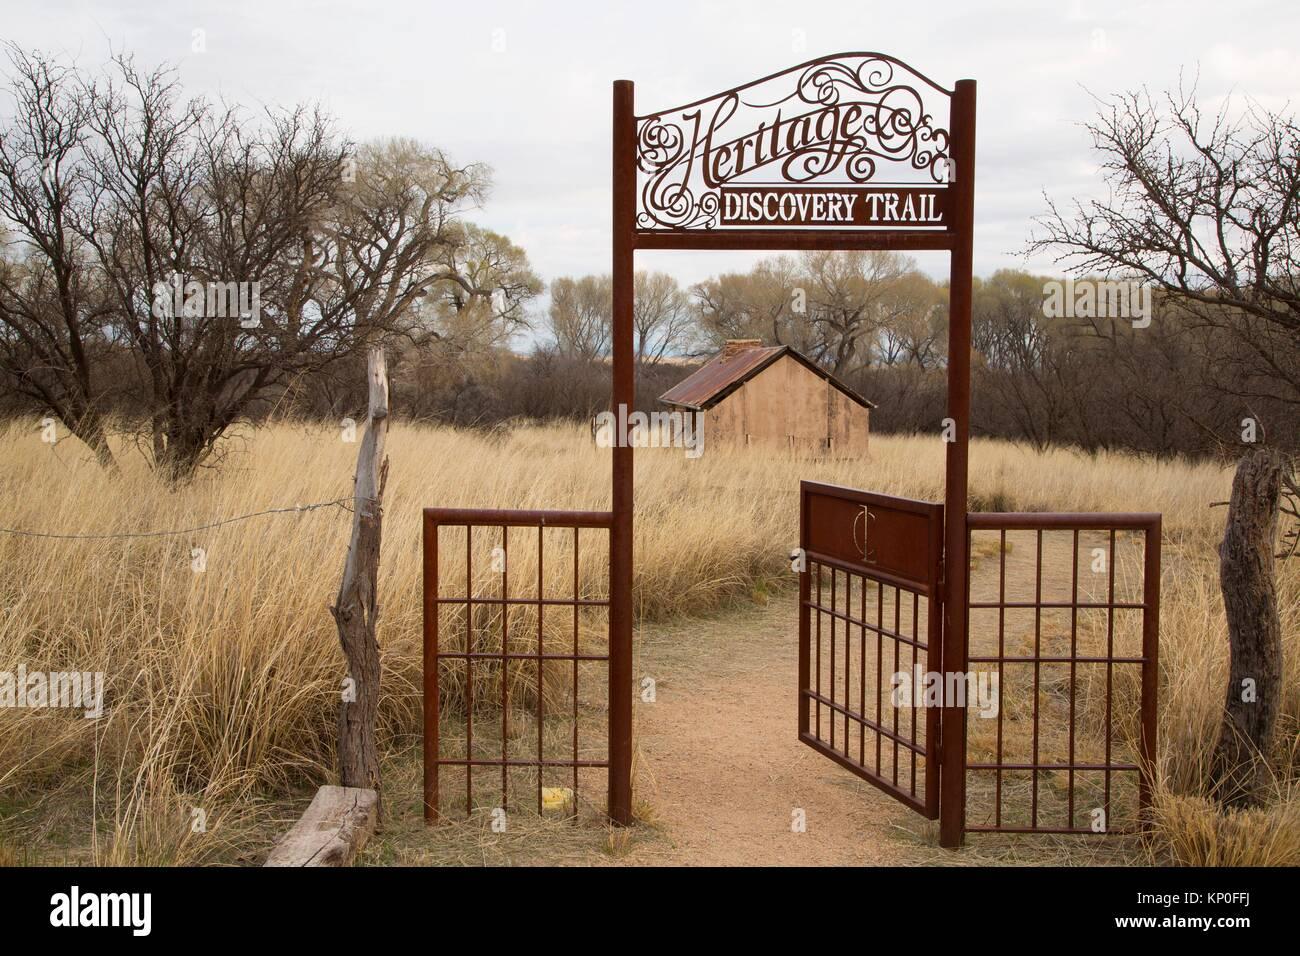 Heritage Discovery Trail gateway, Las Cienegas National Conservation Area, Arizona. Immagini Stock